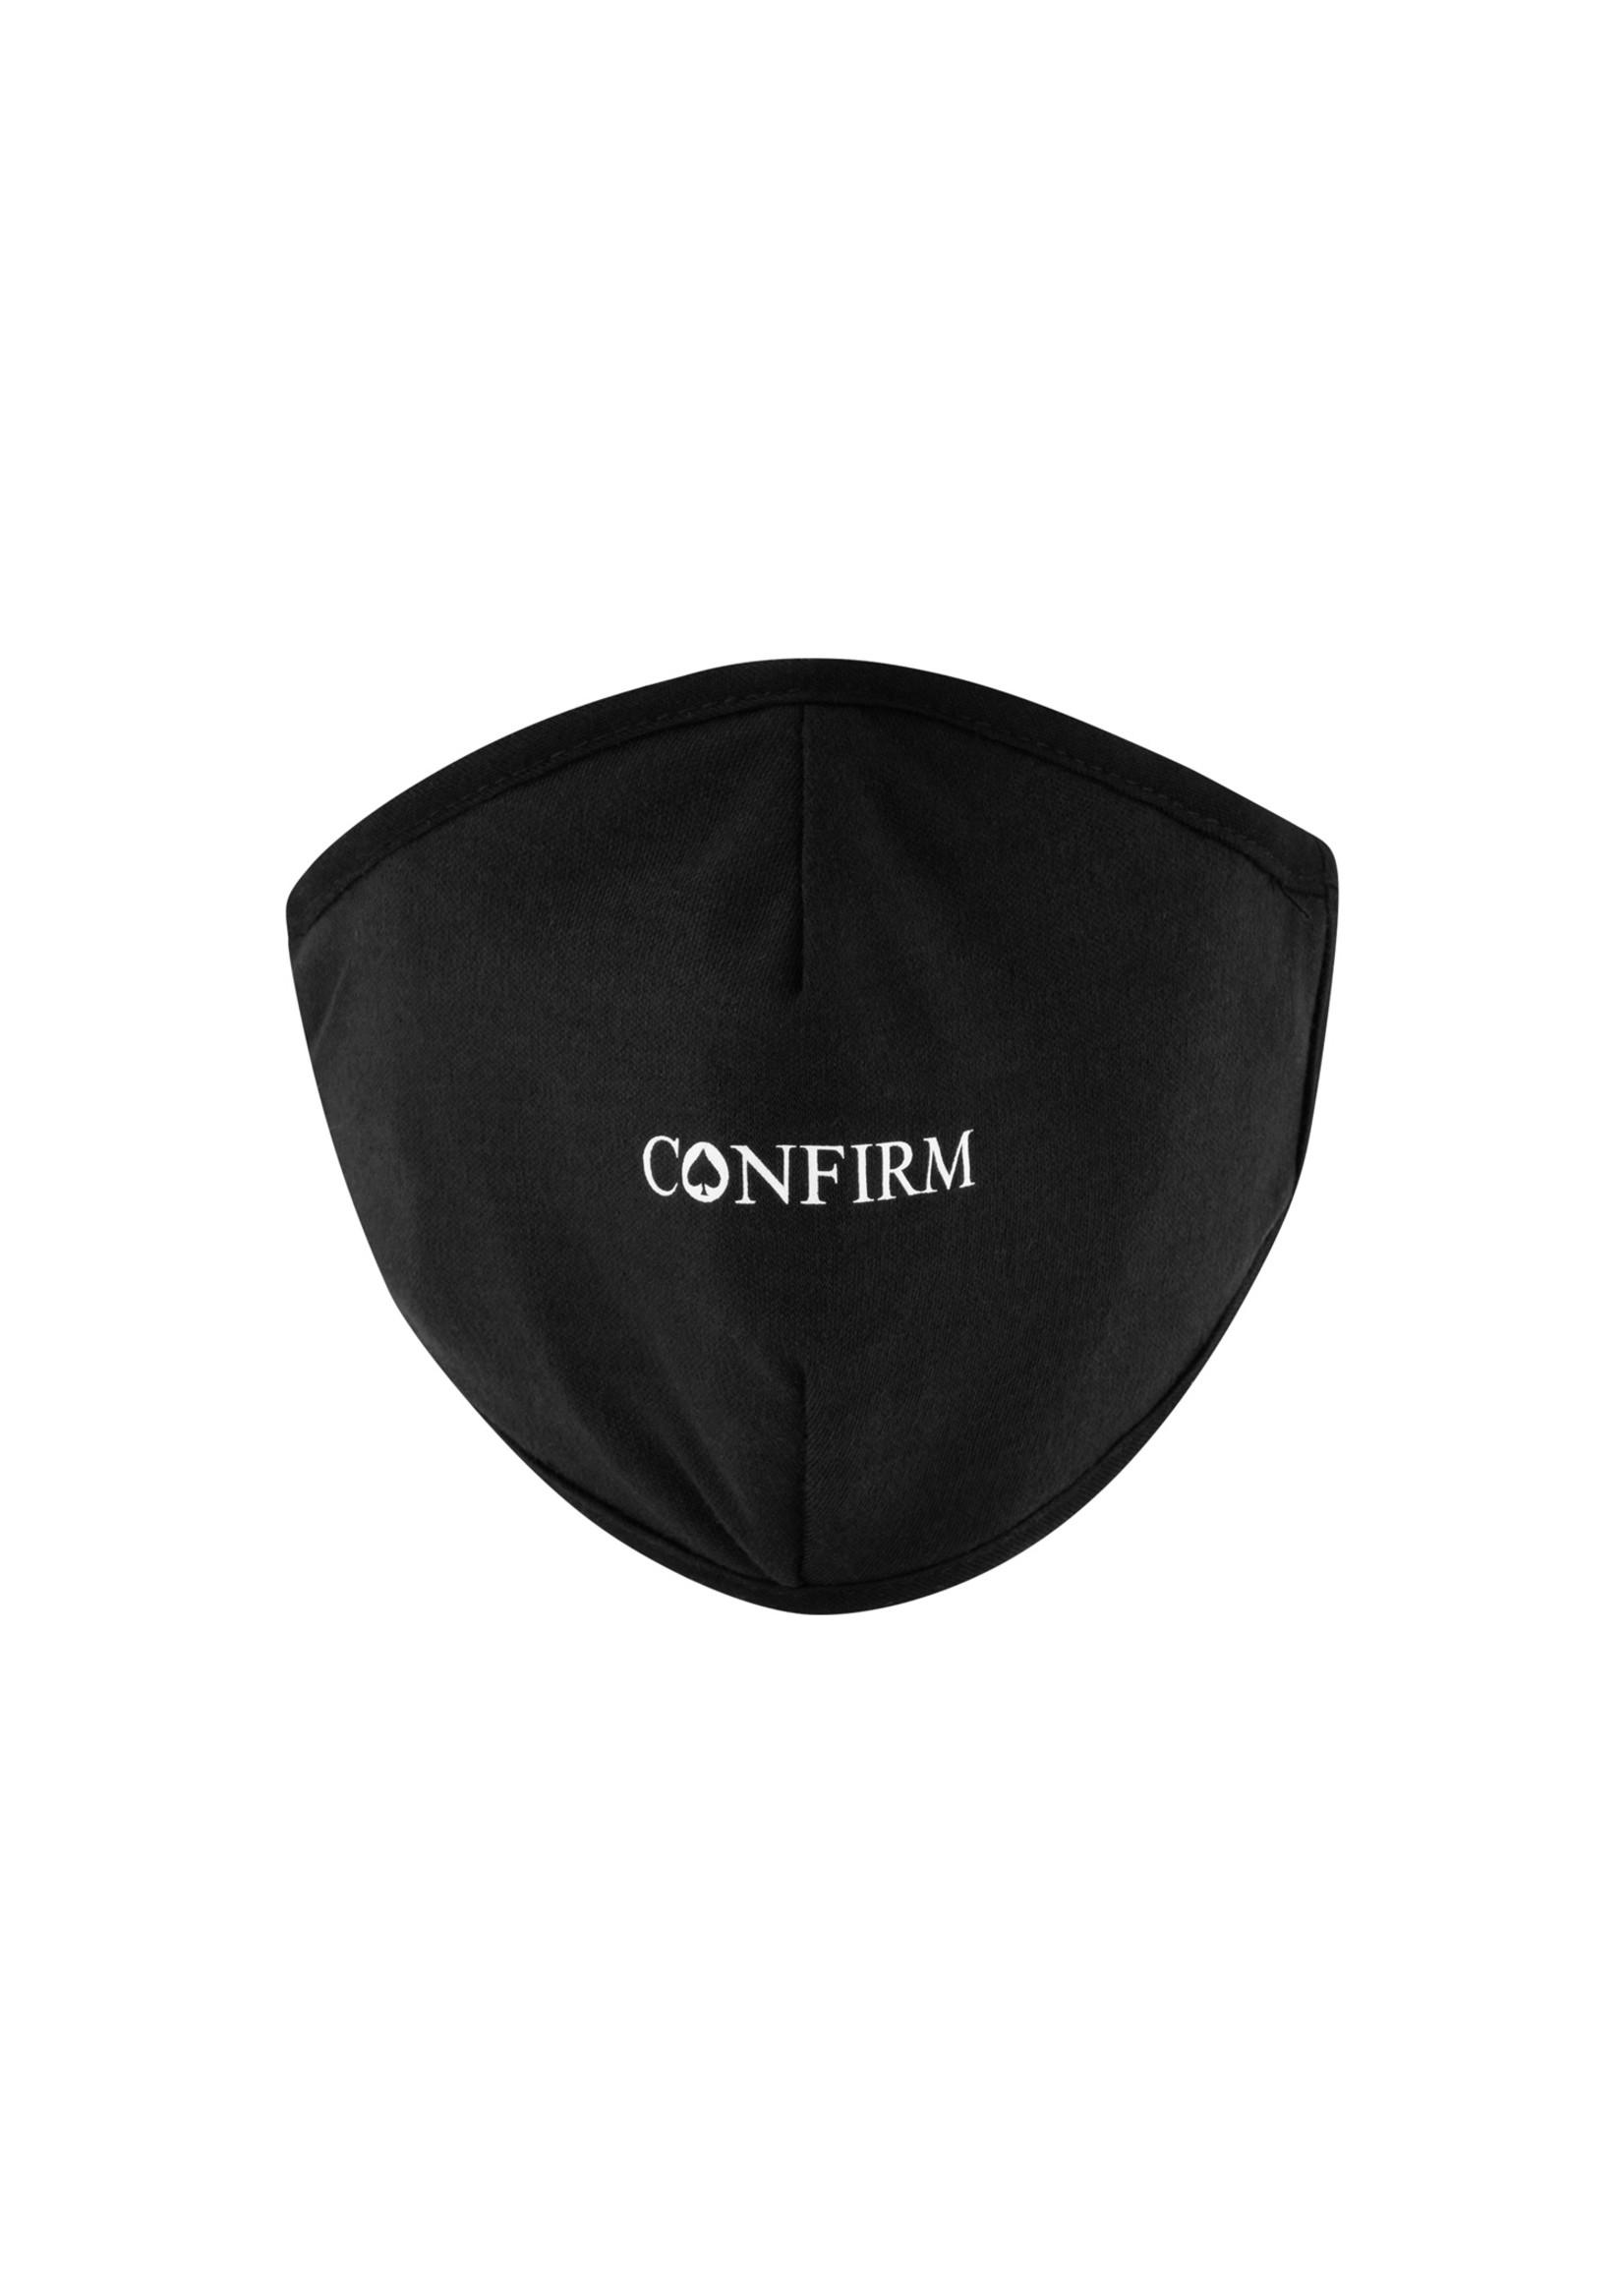 Confirm Mondkapje - zwart/wit